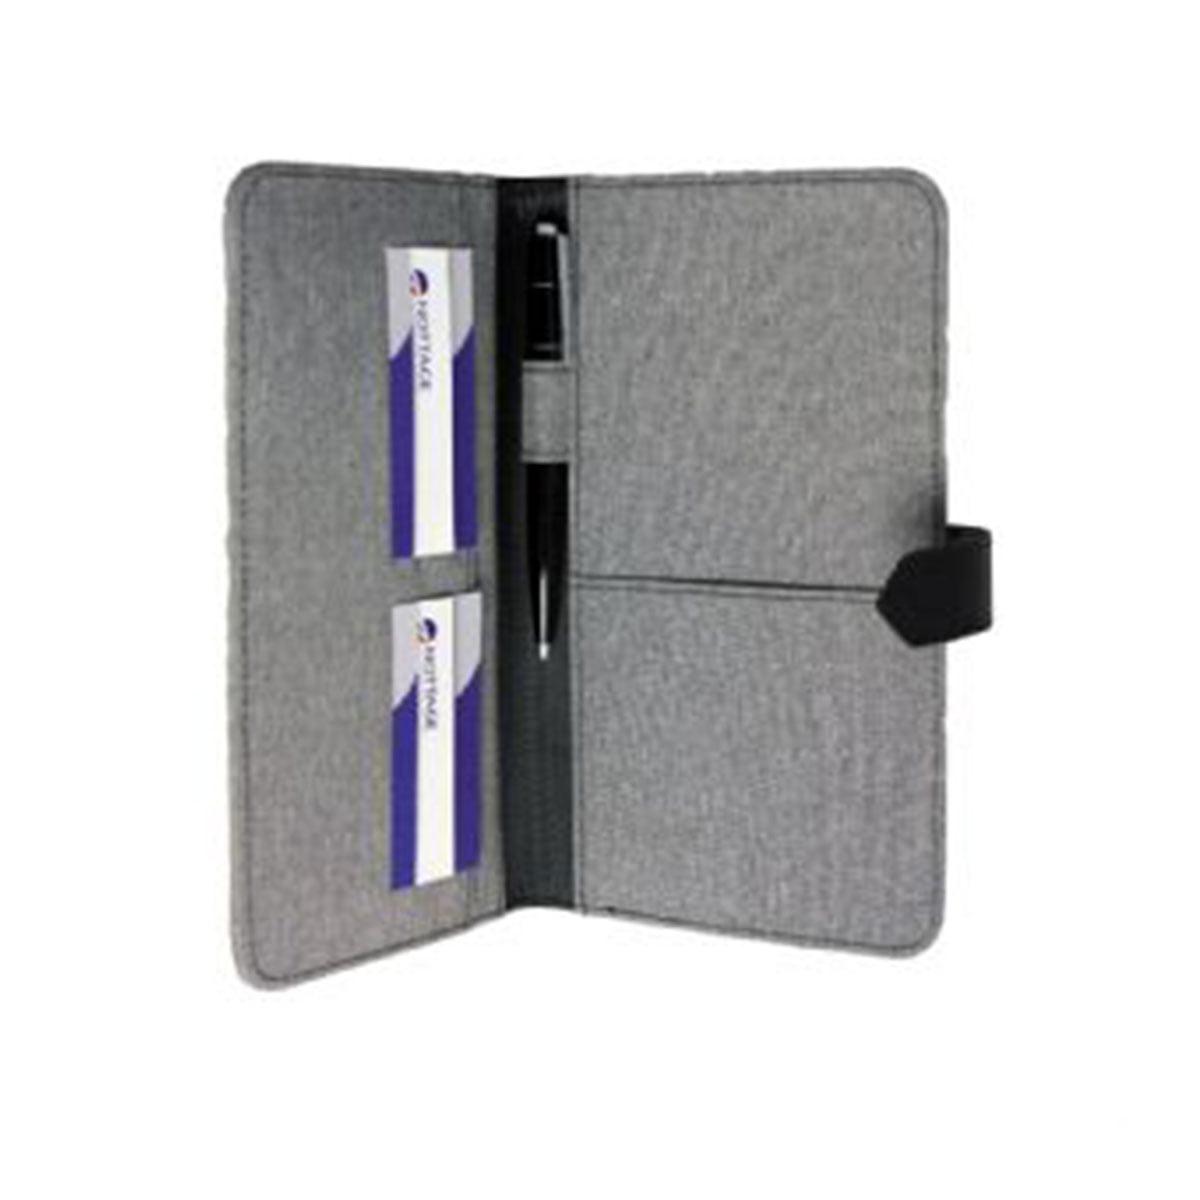 Trekk Passport Holder-Grey